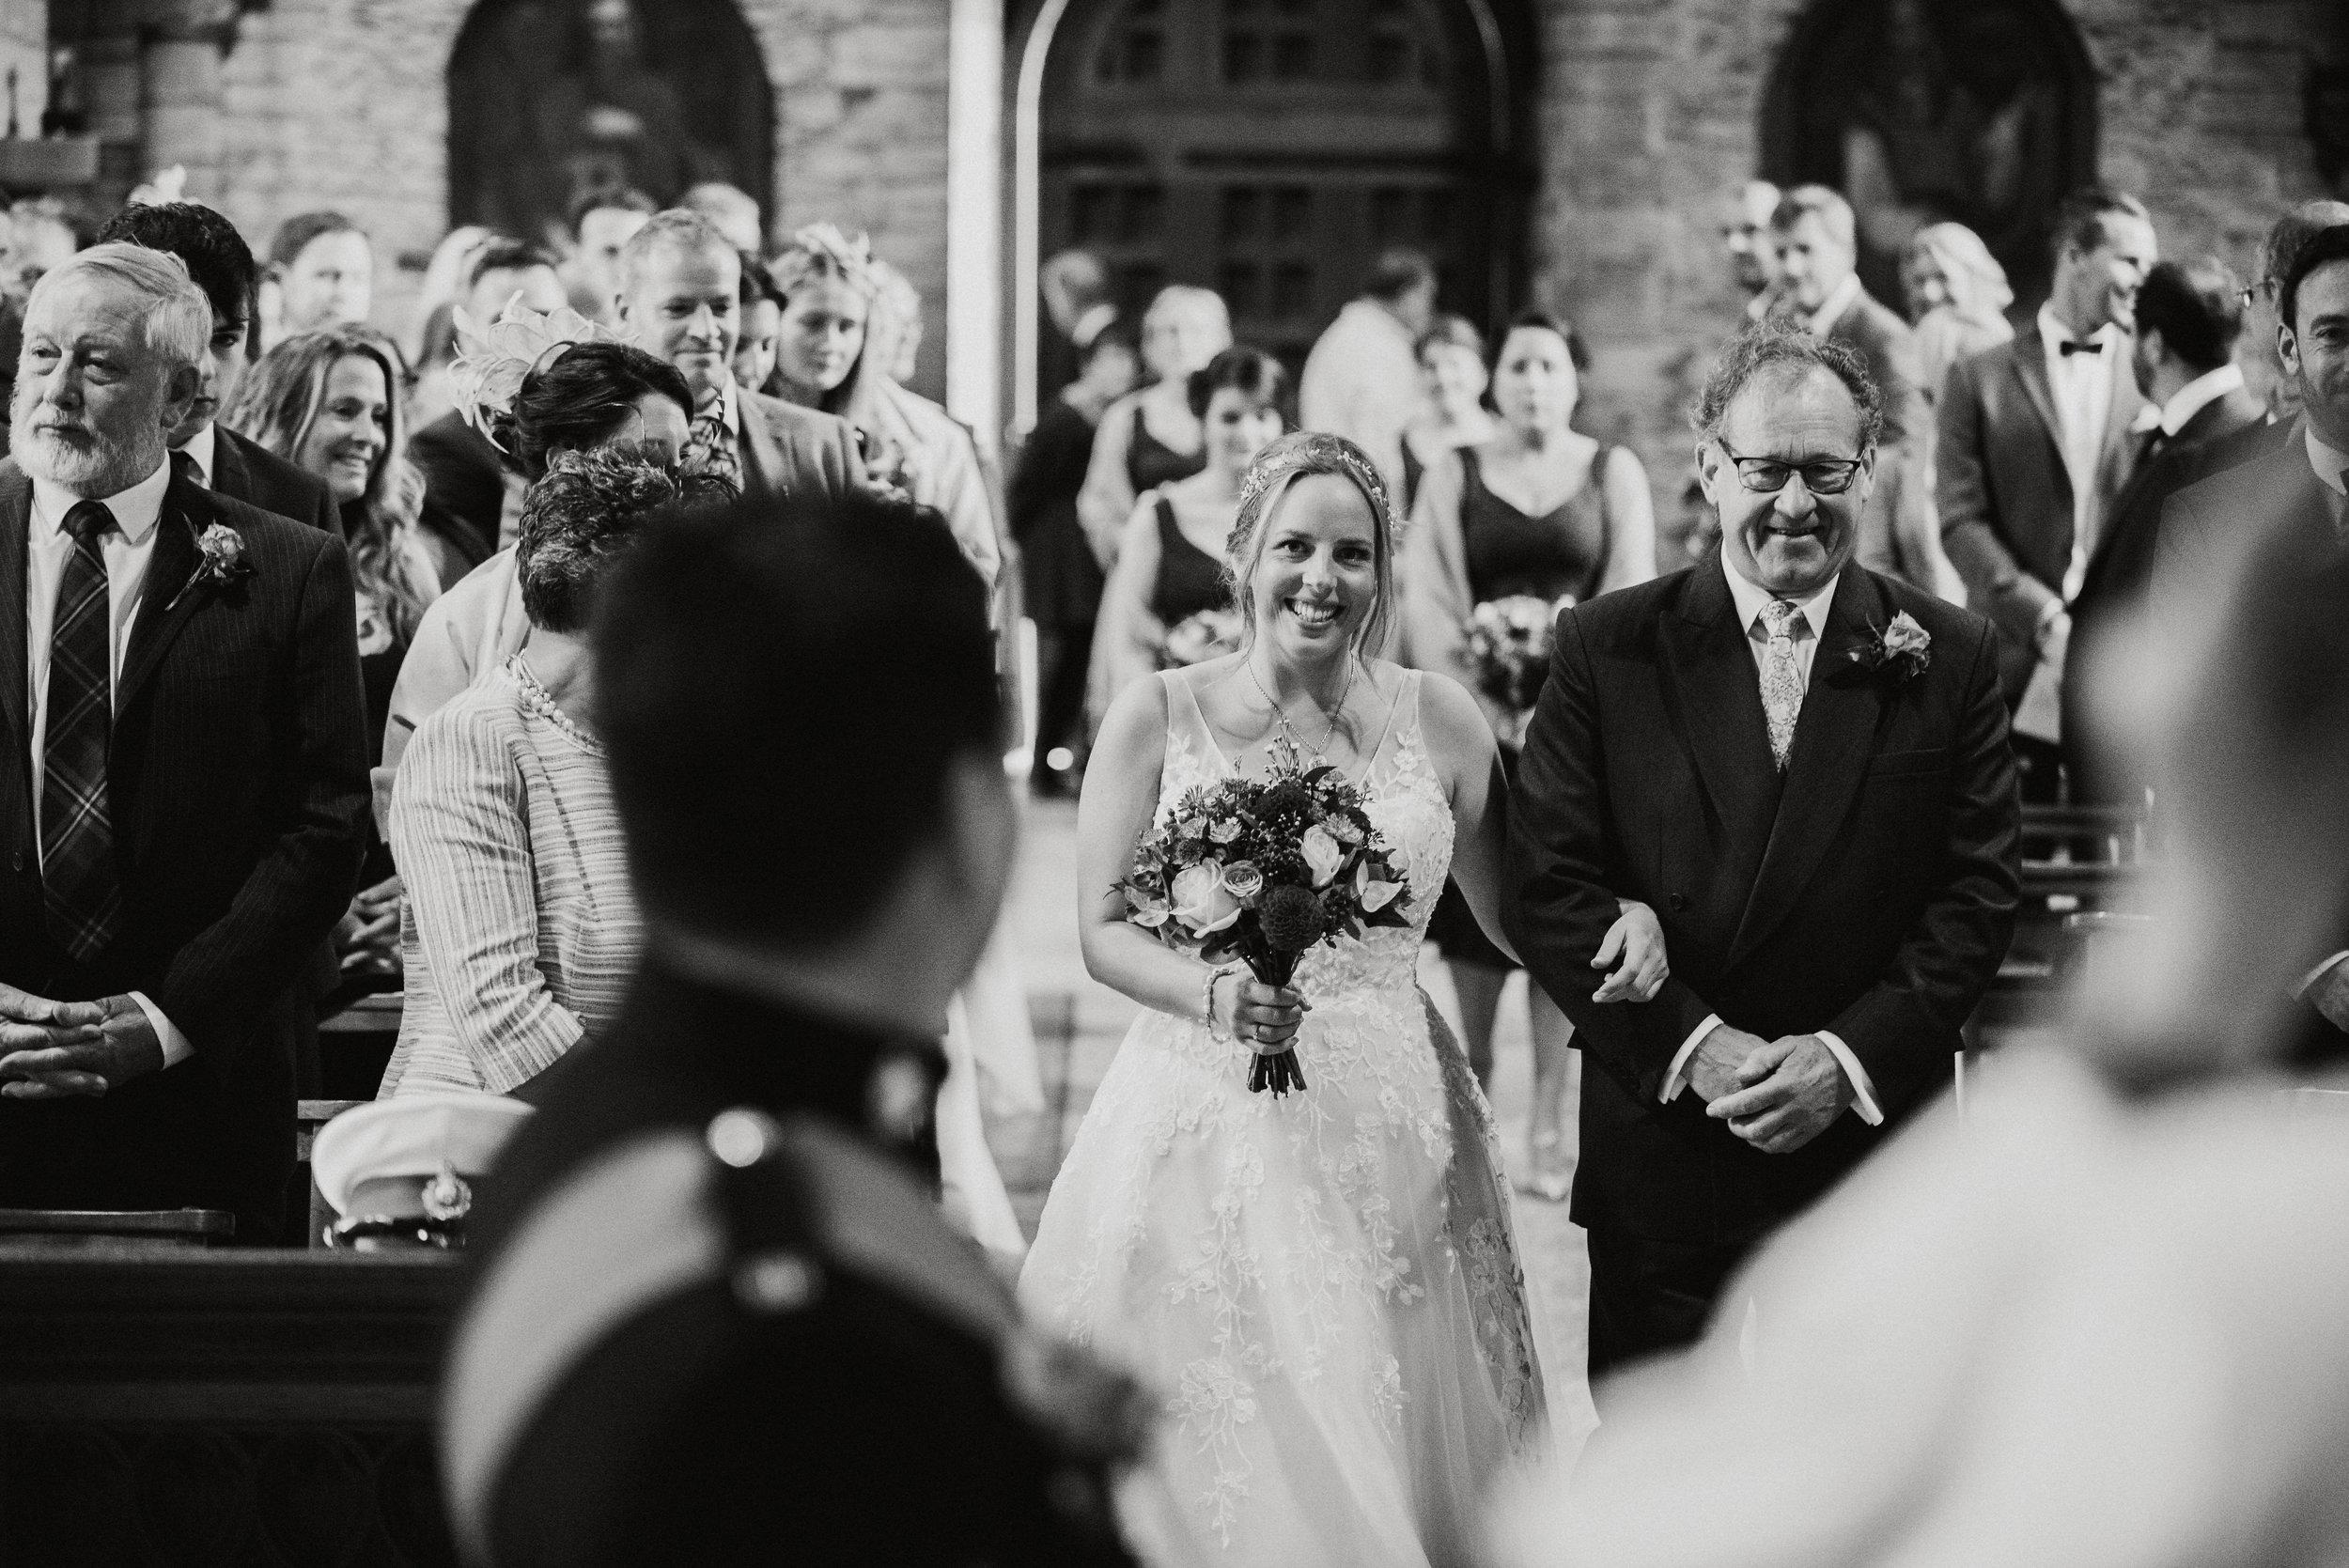 port-eliot-wedding-photographer-28.jpg